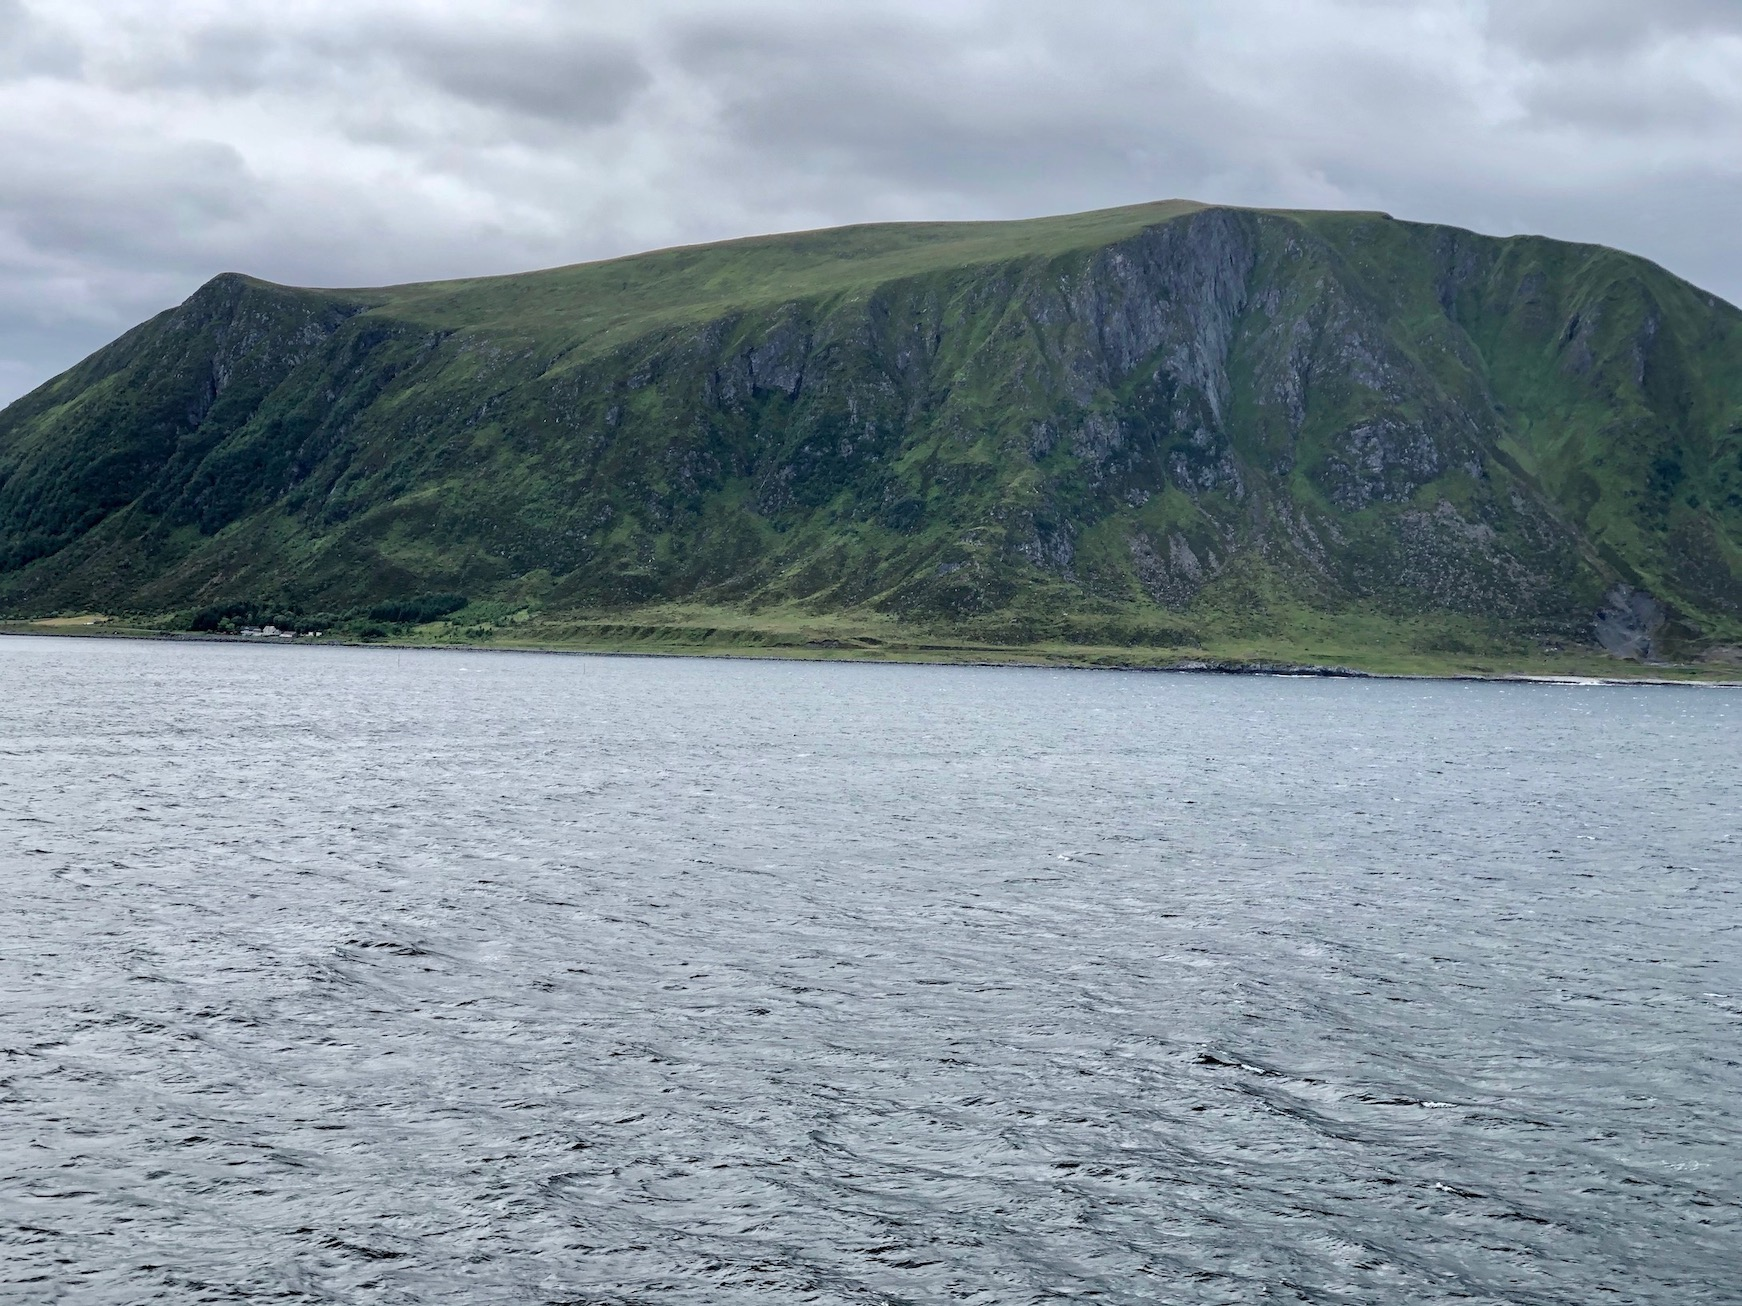 Heröyfjorden